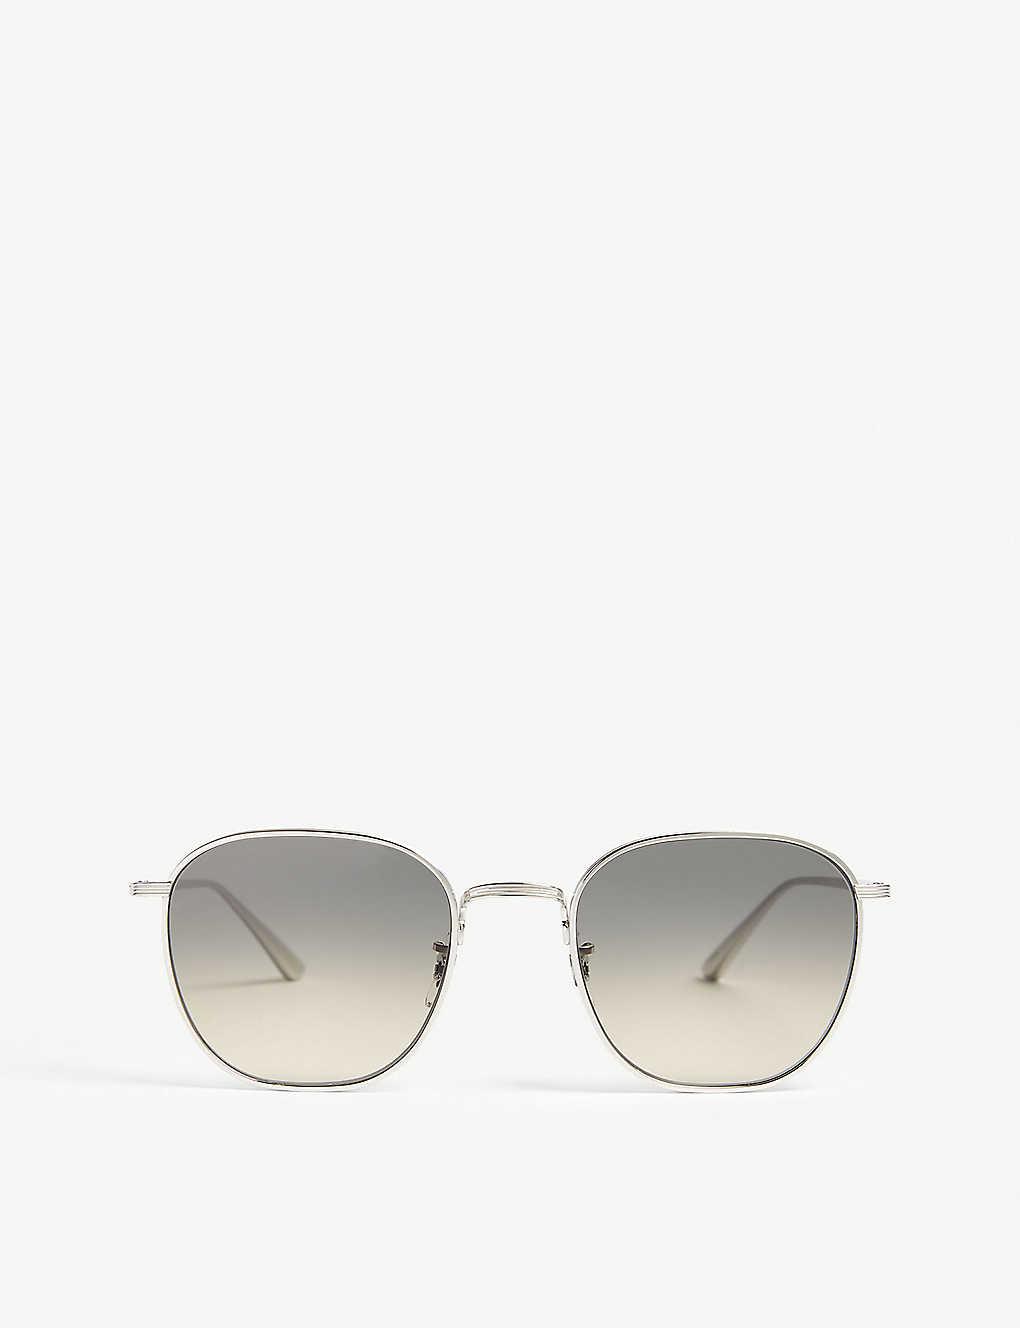 aeedc5d5364d OLIVER PEOPLES - Board Meeting sunglasses | Selfridges.com